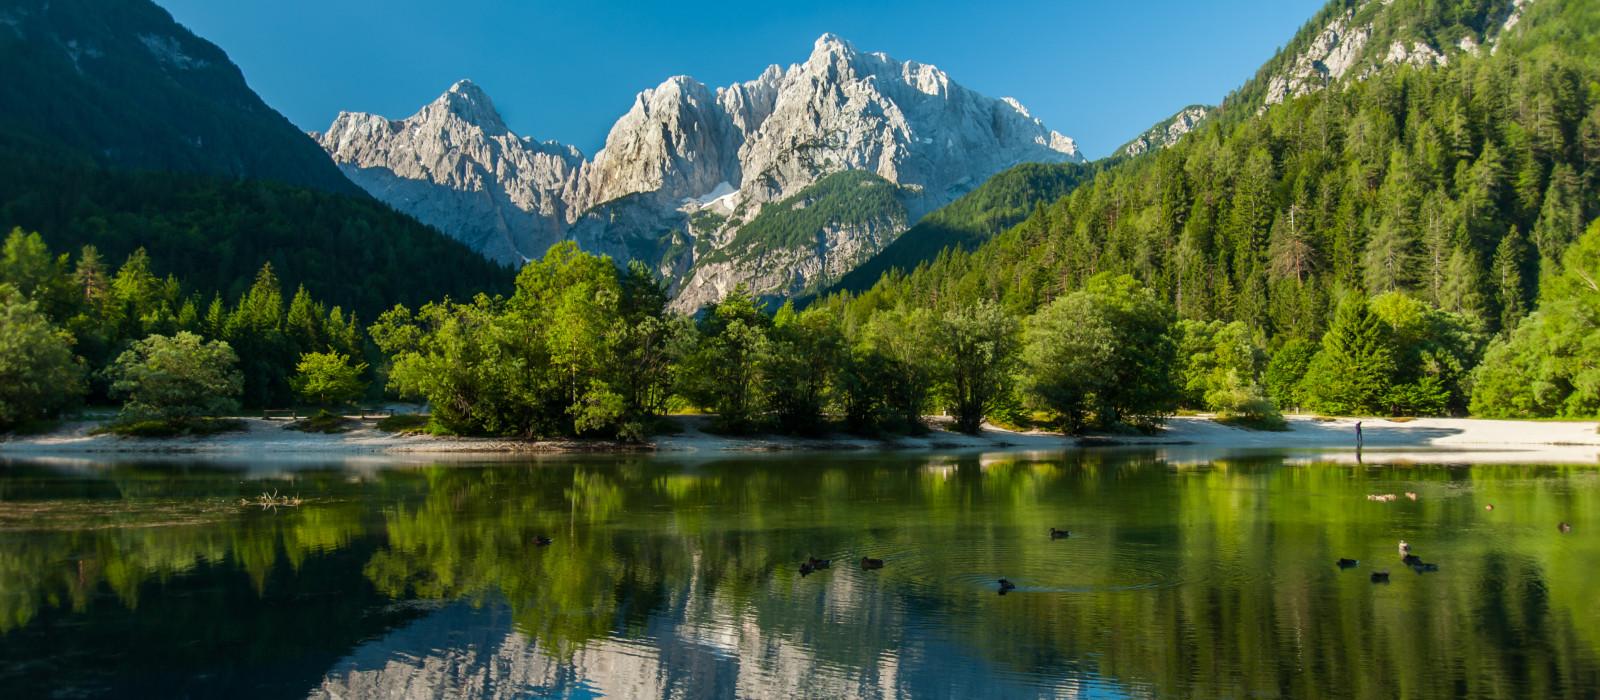 Destination Kranjska Gora Croatia & Slovenia